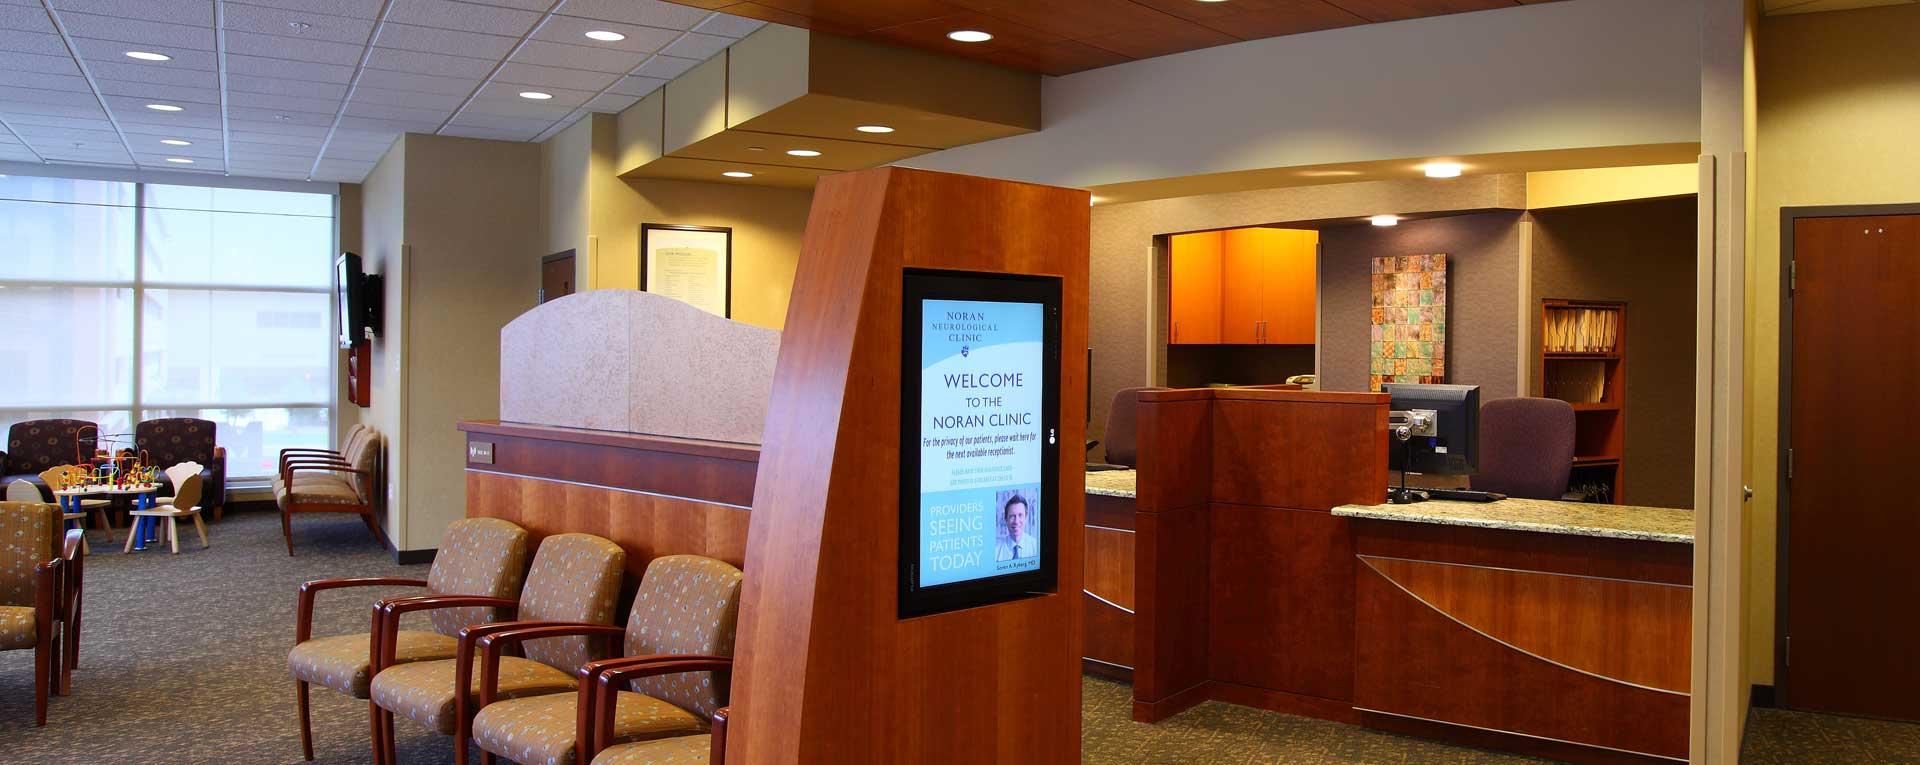 Midtown Noran Clinic Lobby